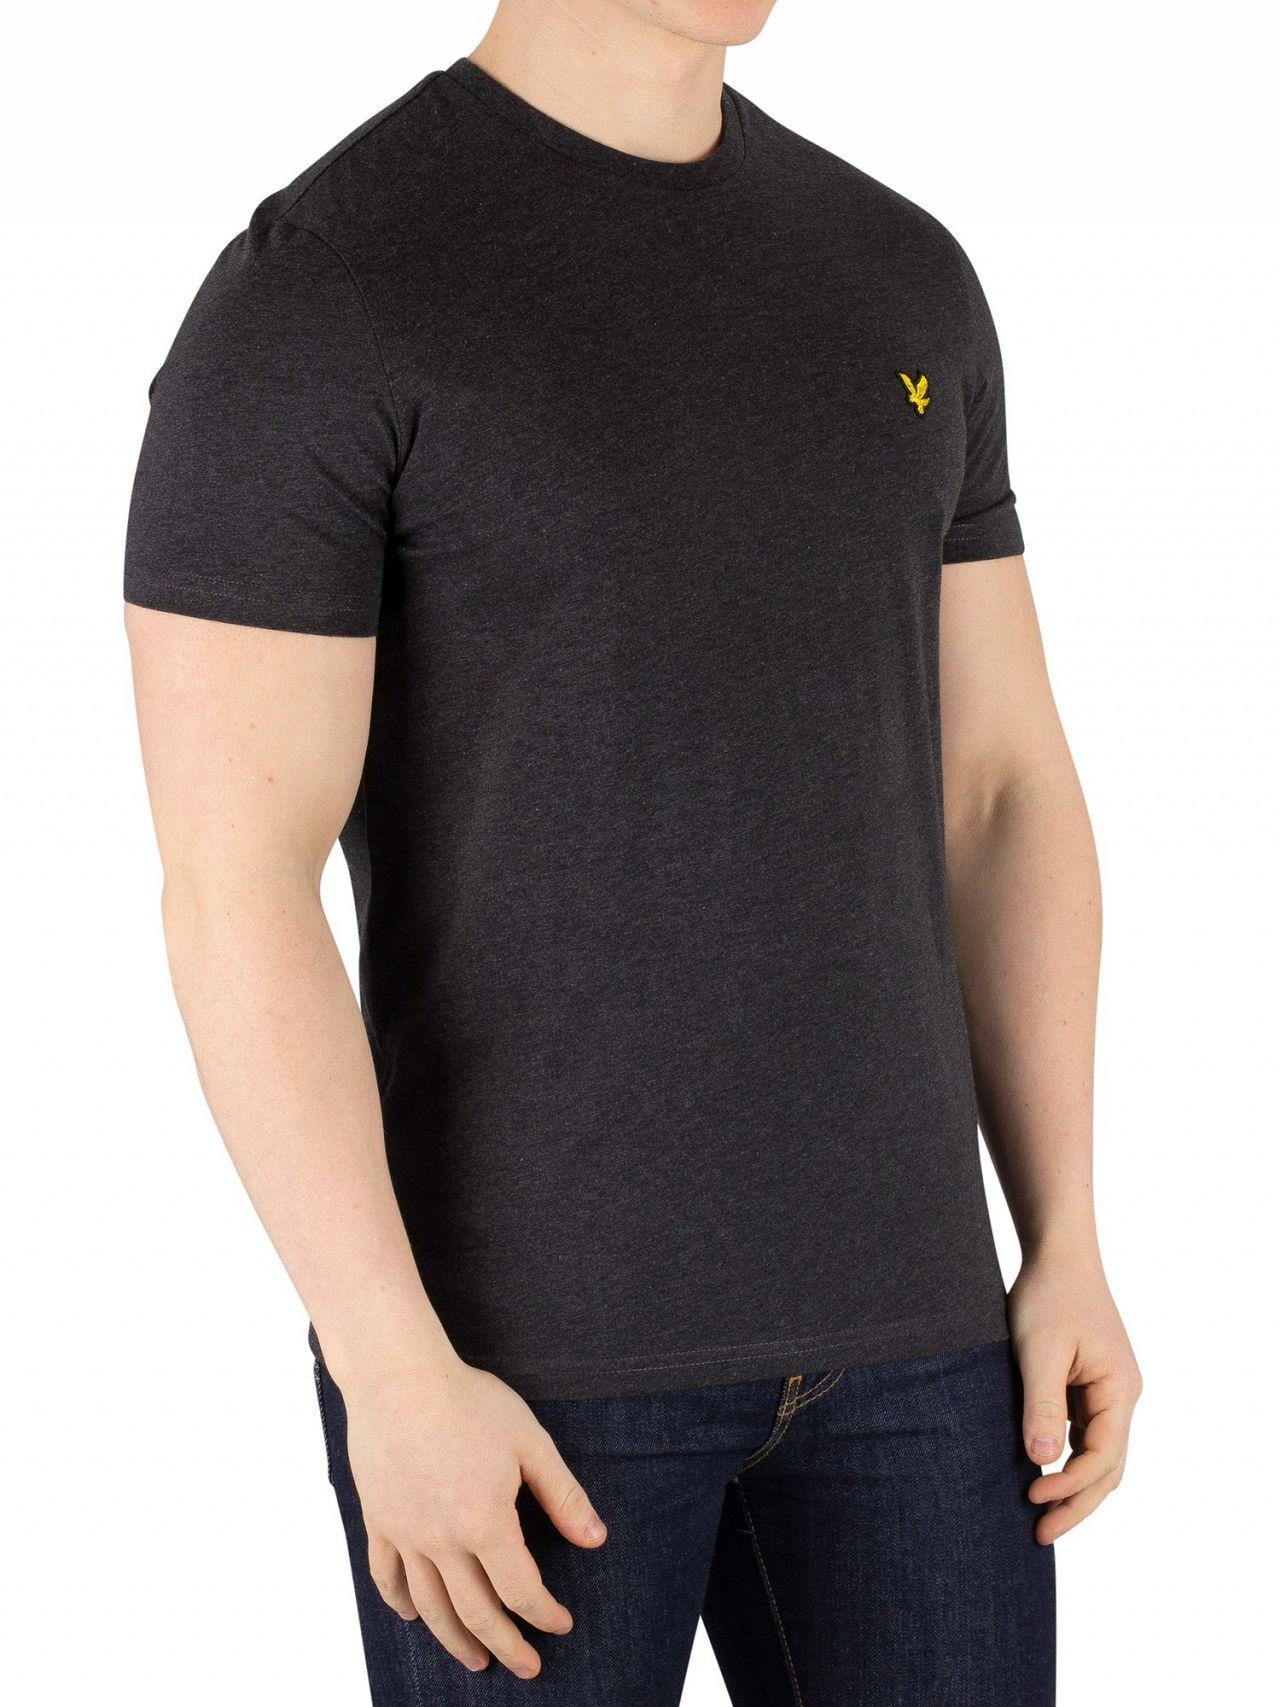 b5ca2cc1c Lyst - Lyle & Scott Charcoal Marl Crew Neck T-shirt in Gray for Men